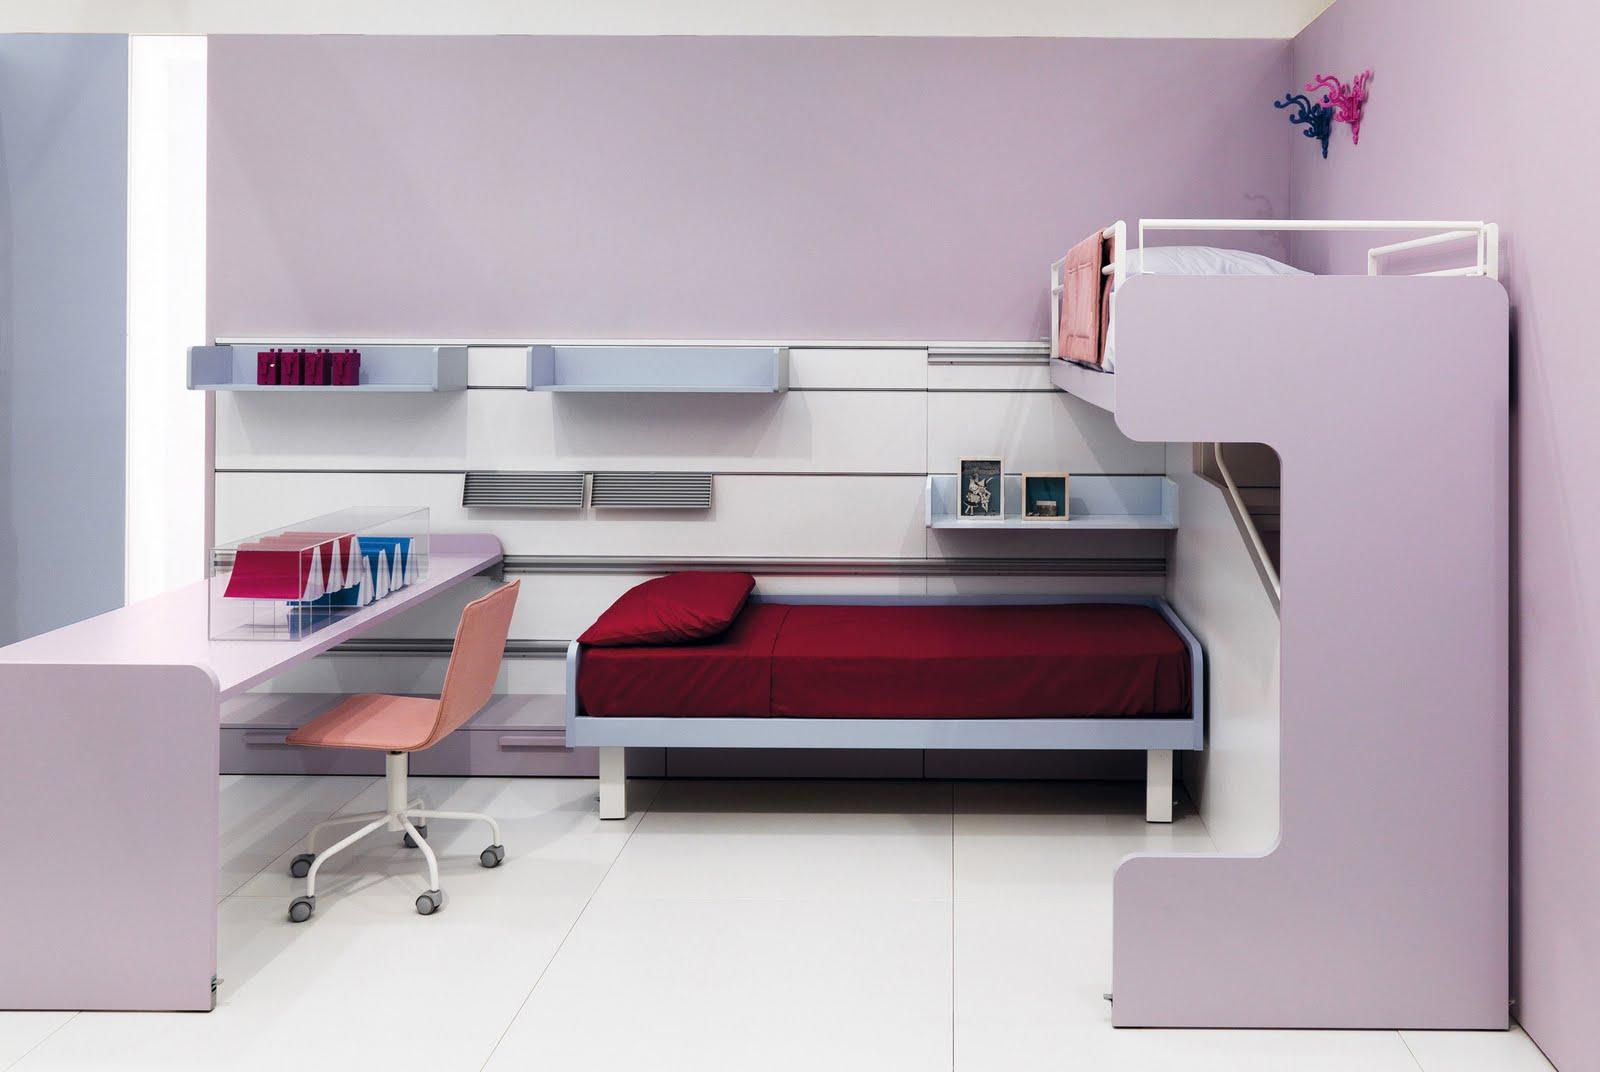 Decora el hogar dormitorios modernos y juveniles for Adornos de decoracion modernos